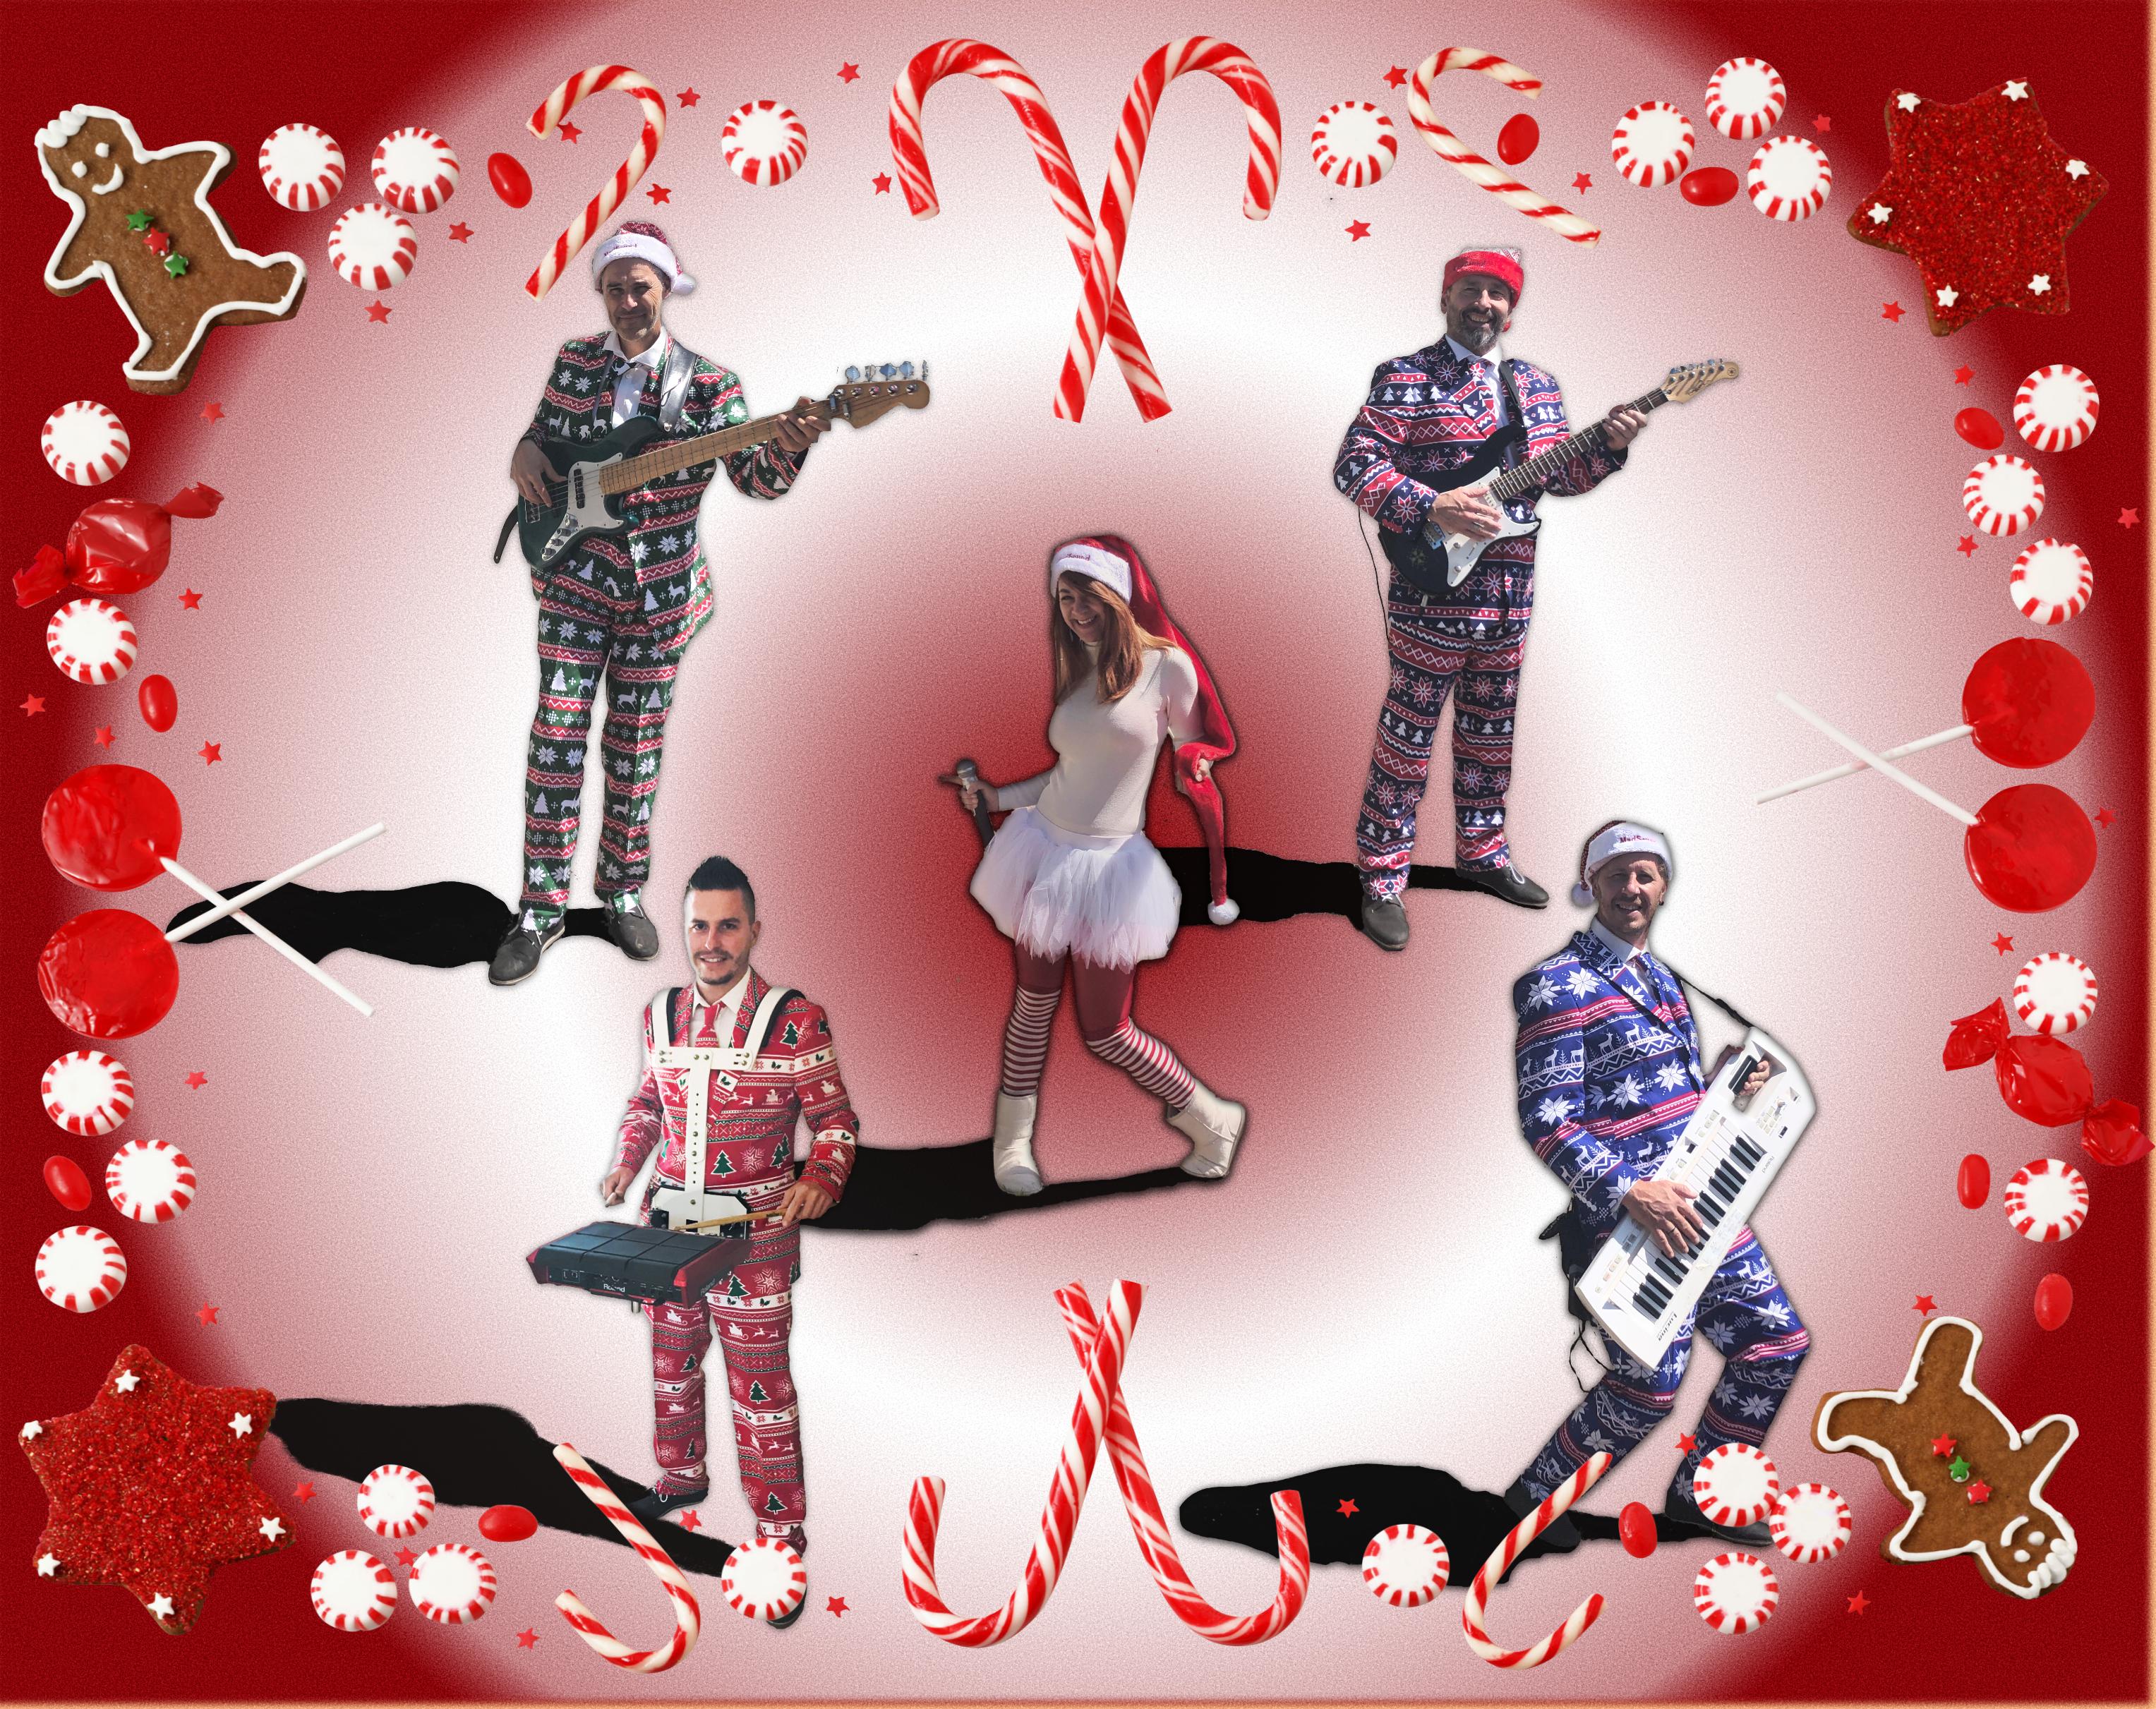 MadSound - Orchestre de Noël